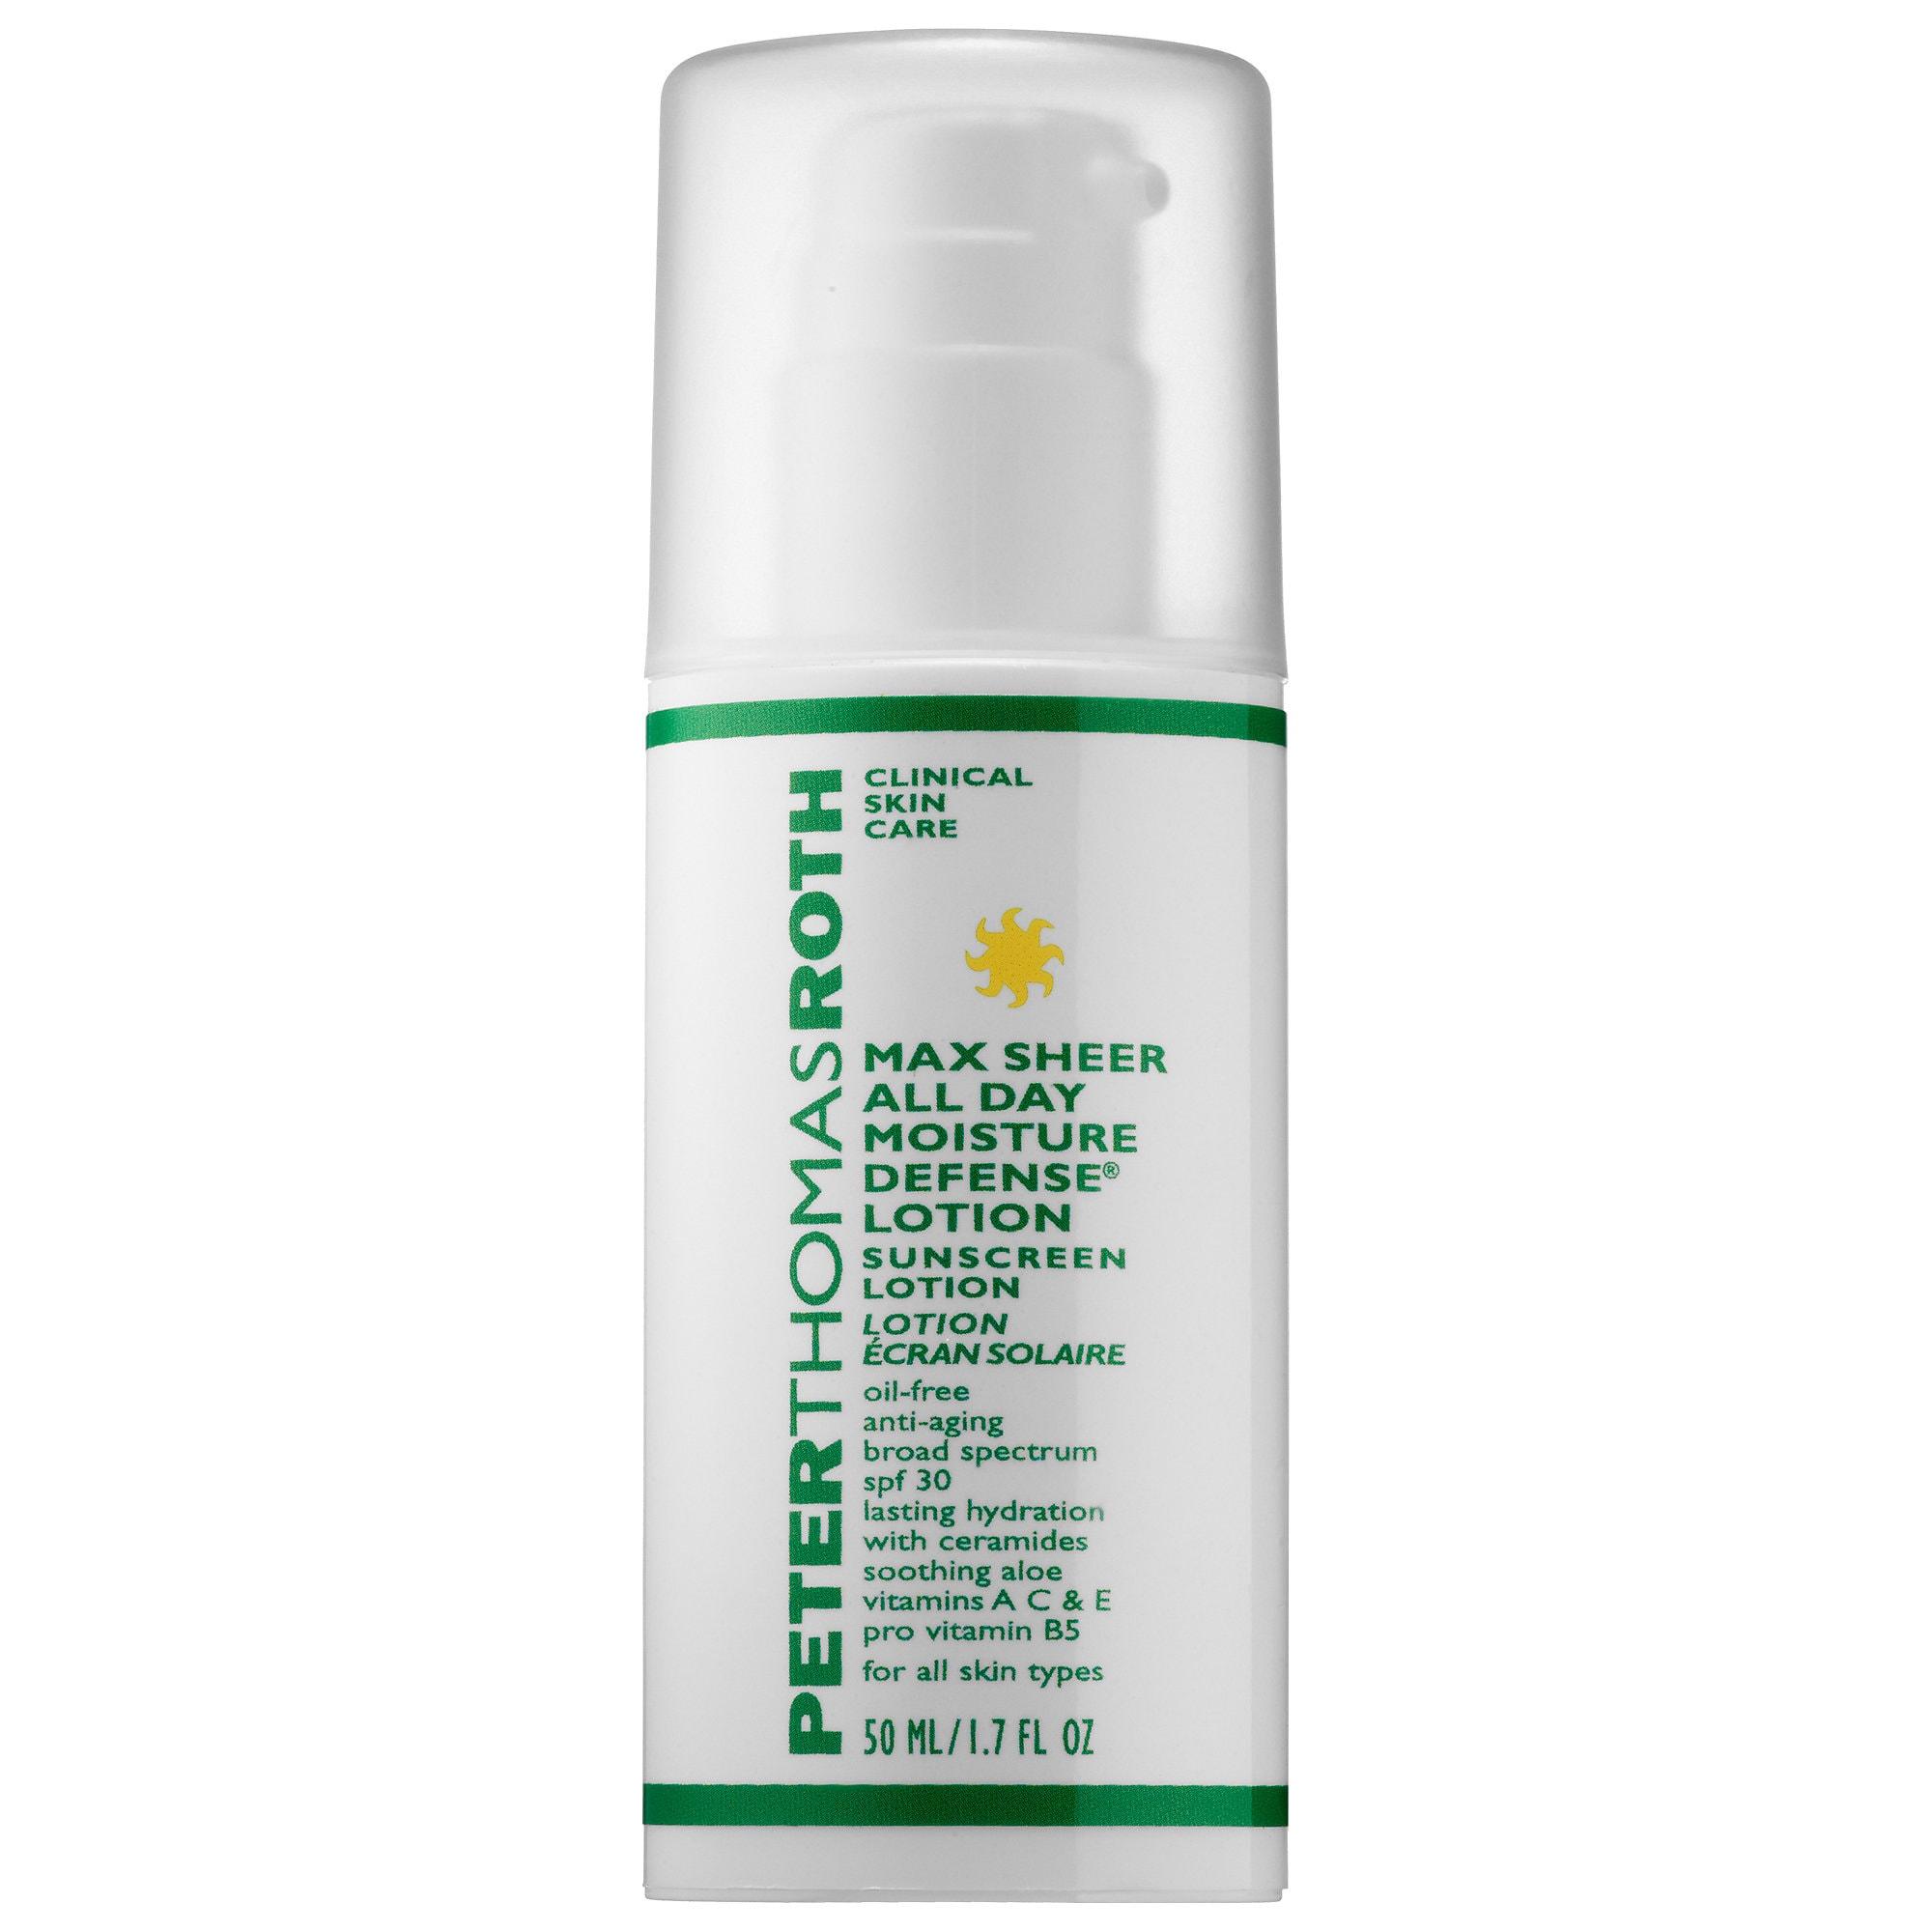 Sephora - Max Sheer All Day Moisture Defense Lotion SPF 30 Sunscreen Lotion - Peter Thomas Roth | Sephora